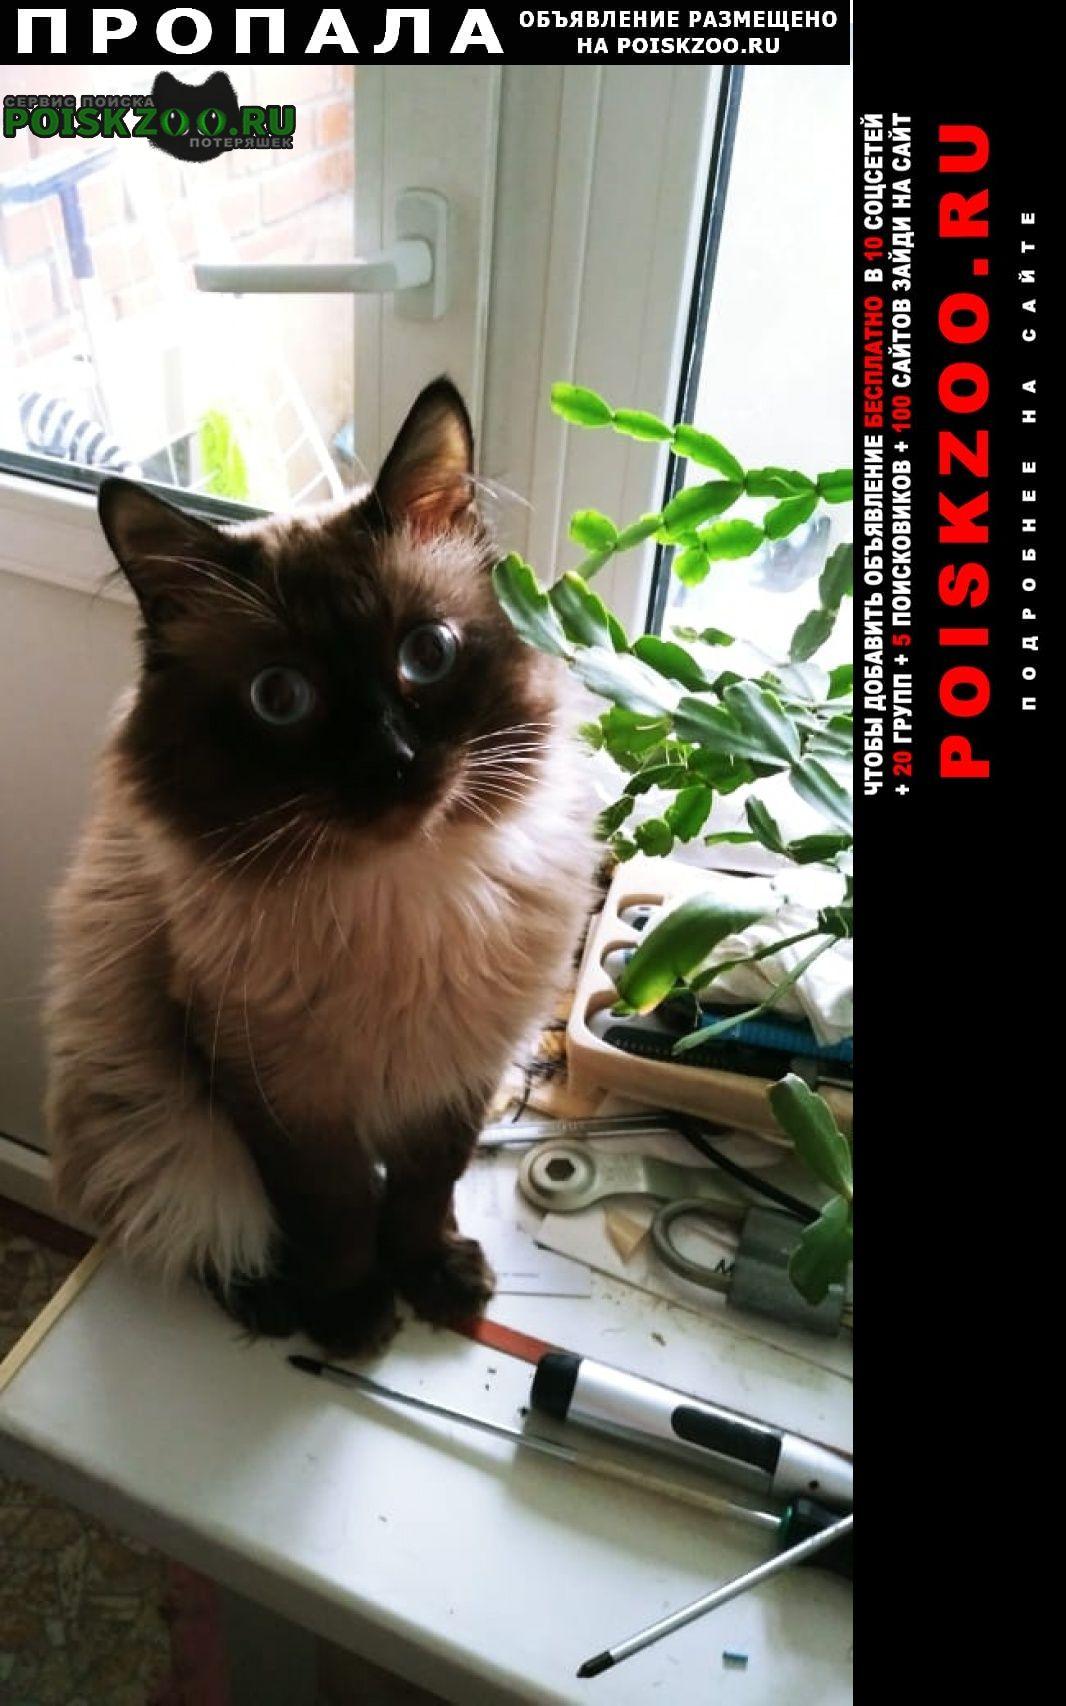 Йошкар-Ола Пропала кошка любимый кот